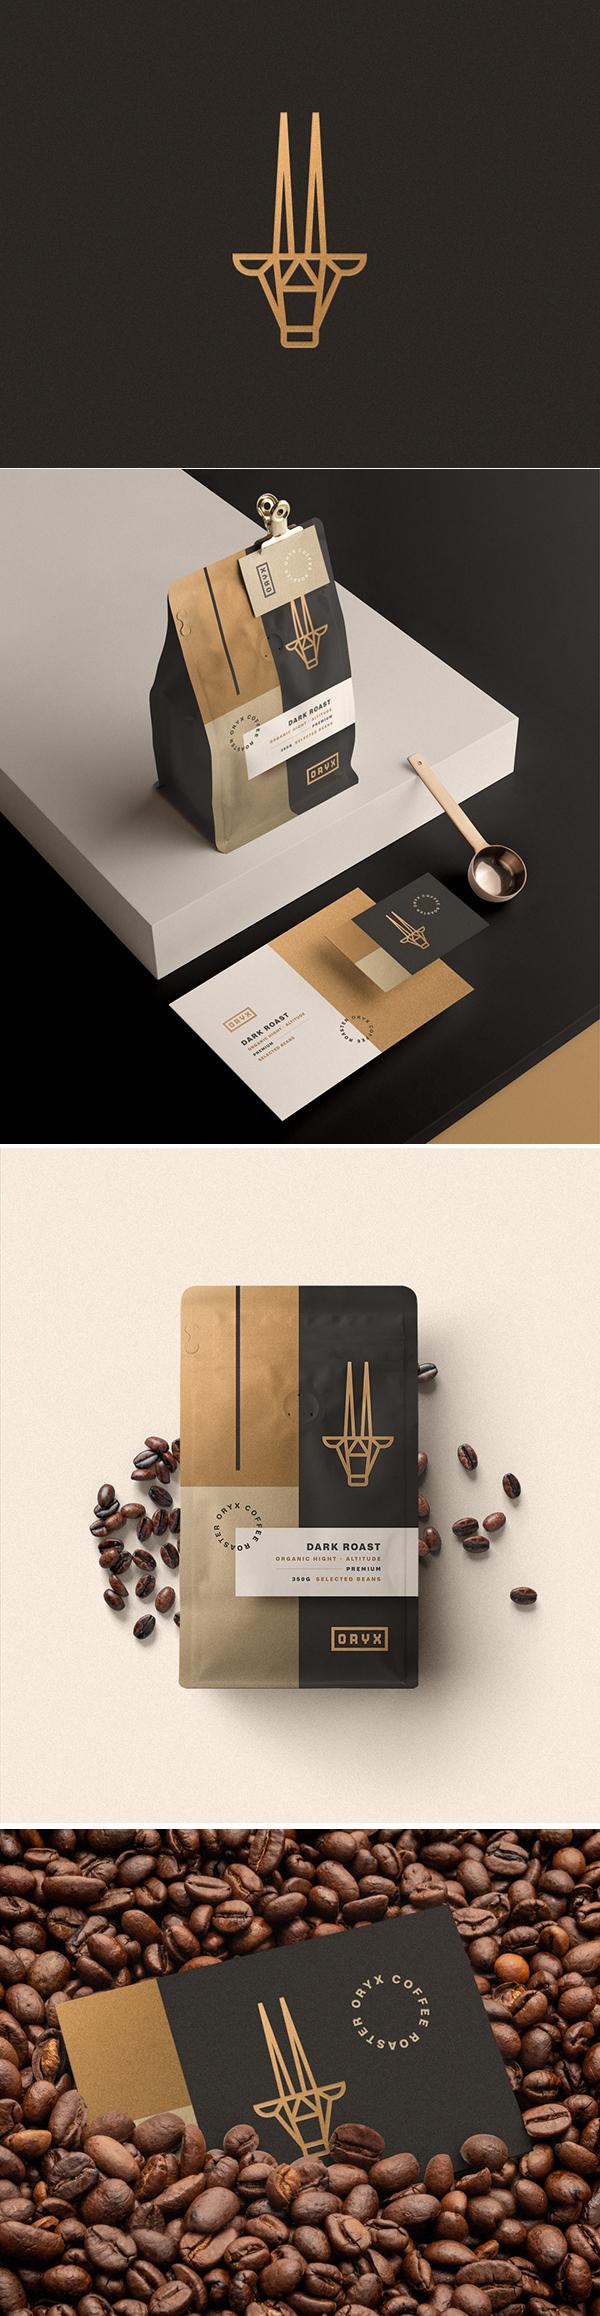 Oryx Coffee Roaster Branding by Guilherme Vissotto